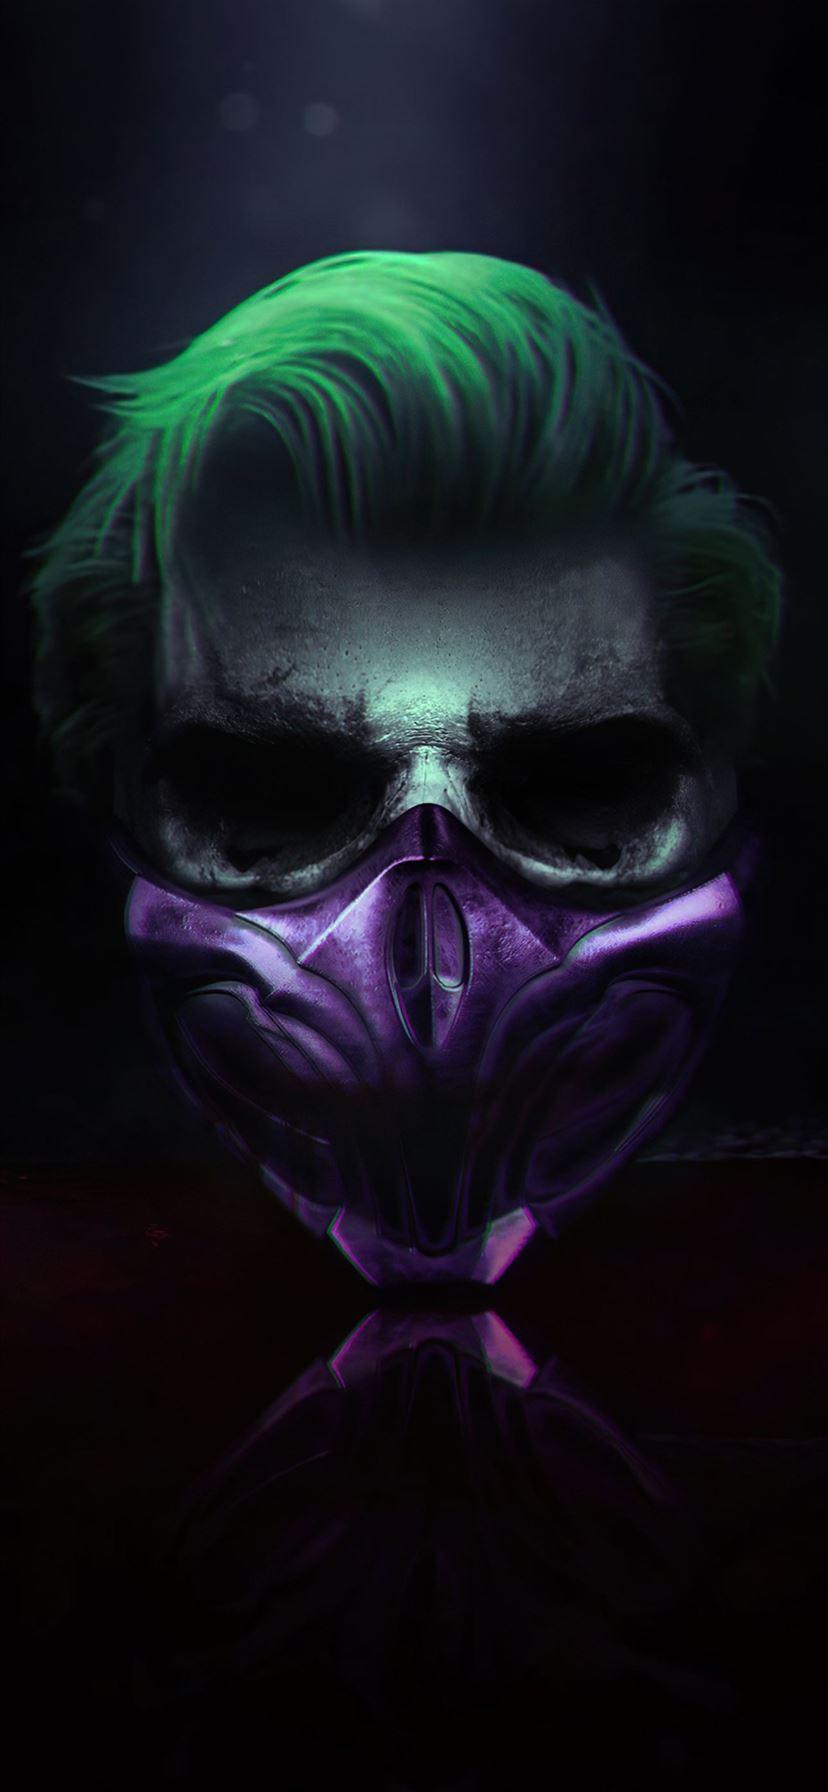 4k Joker Mask Iphone 11 Wallpapers Free Download